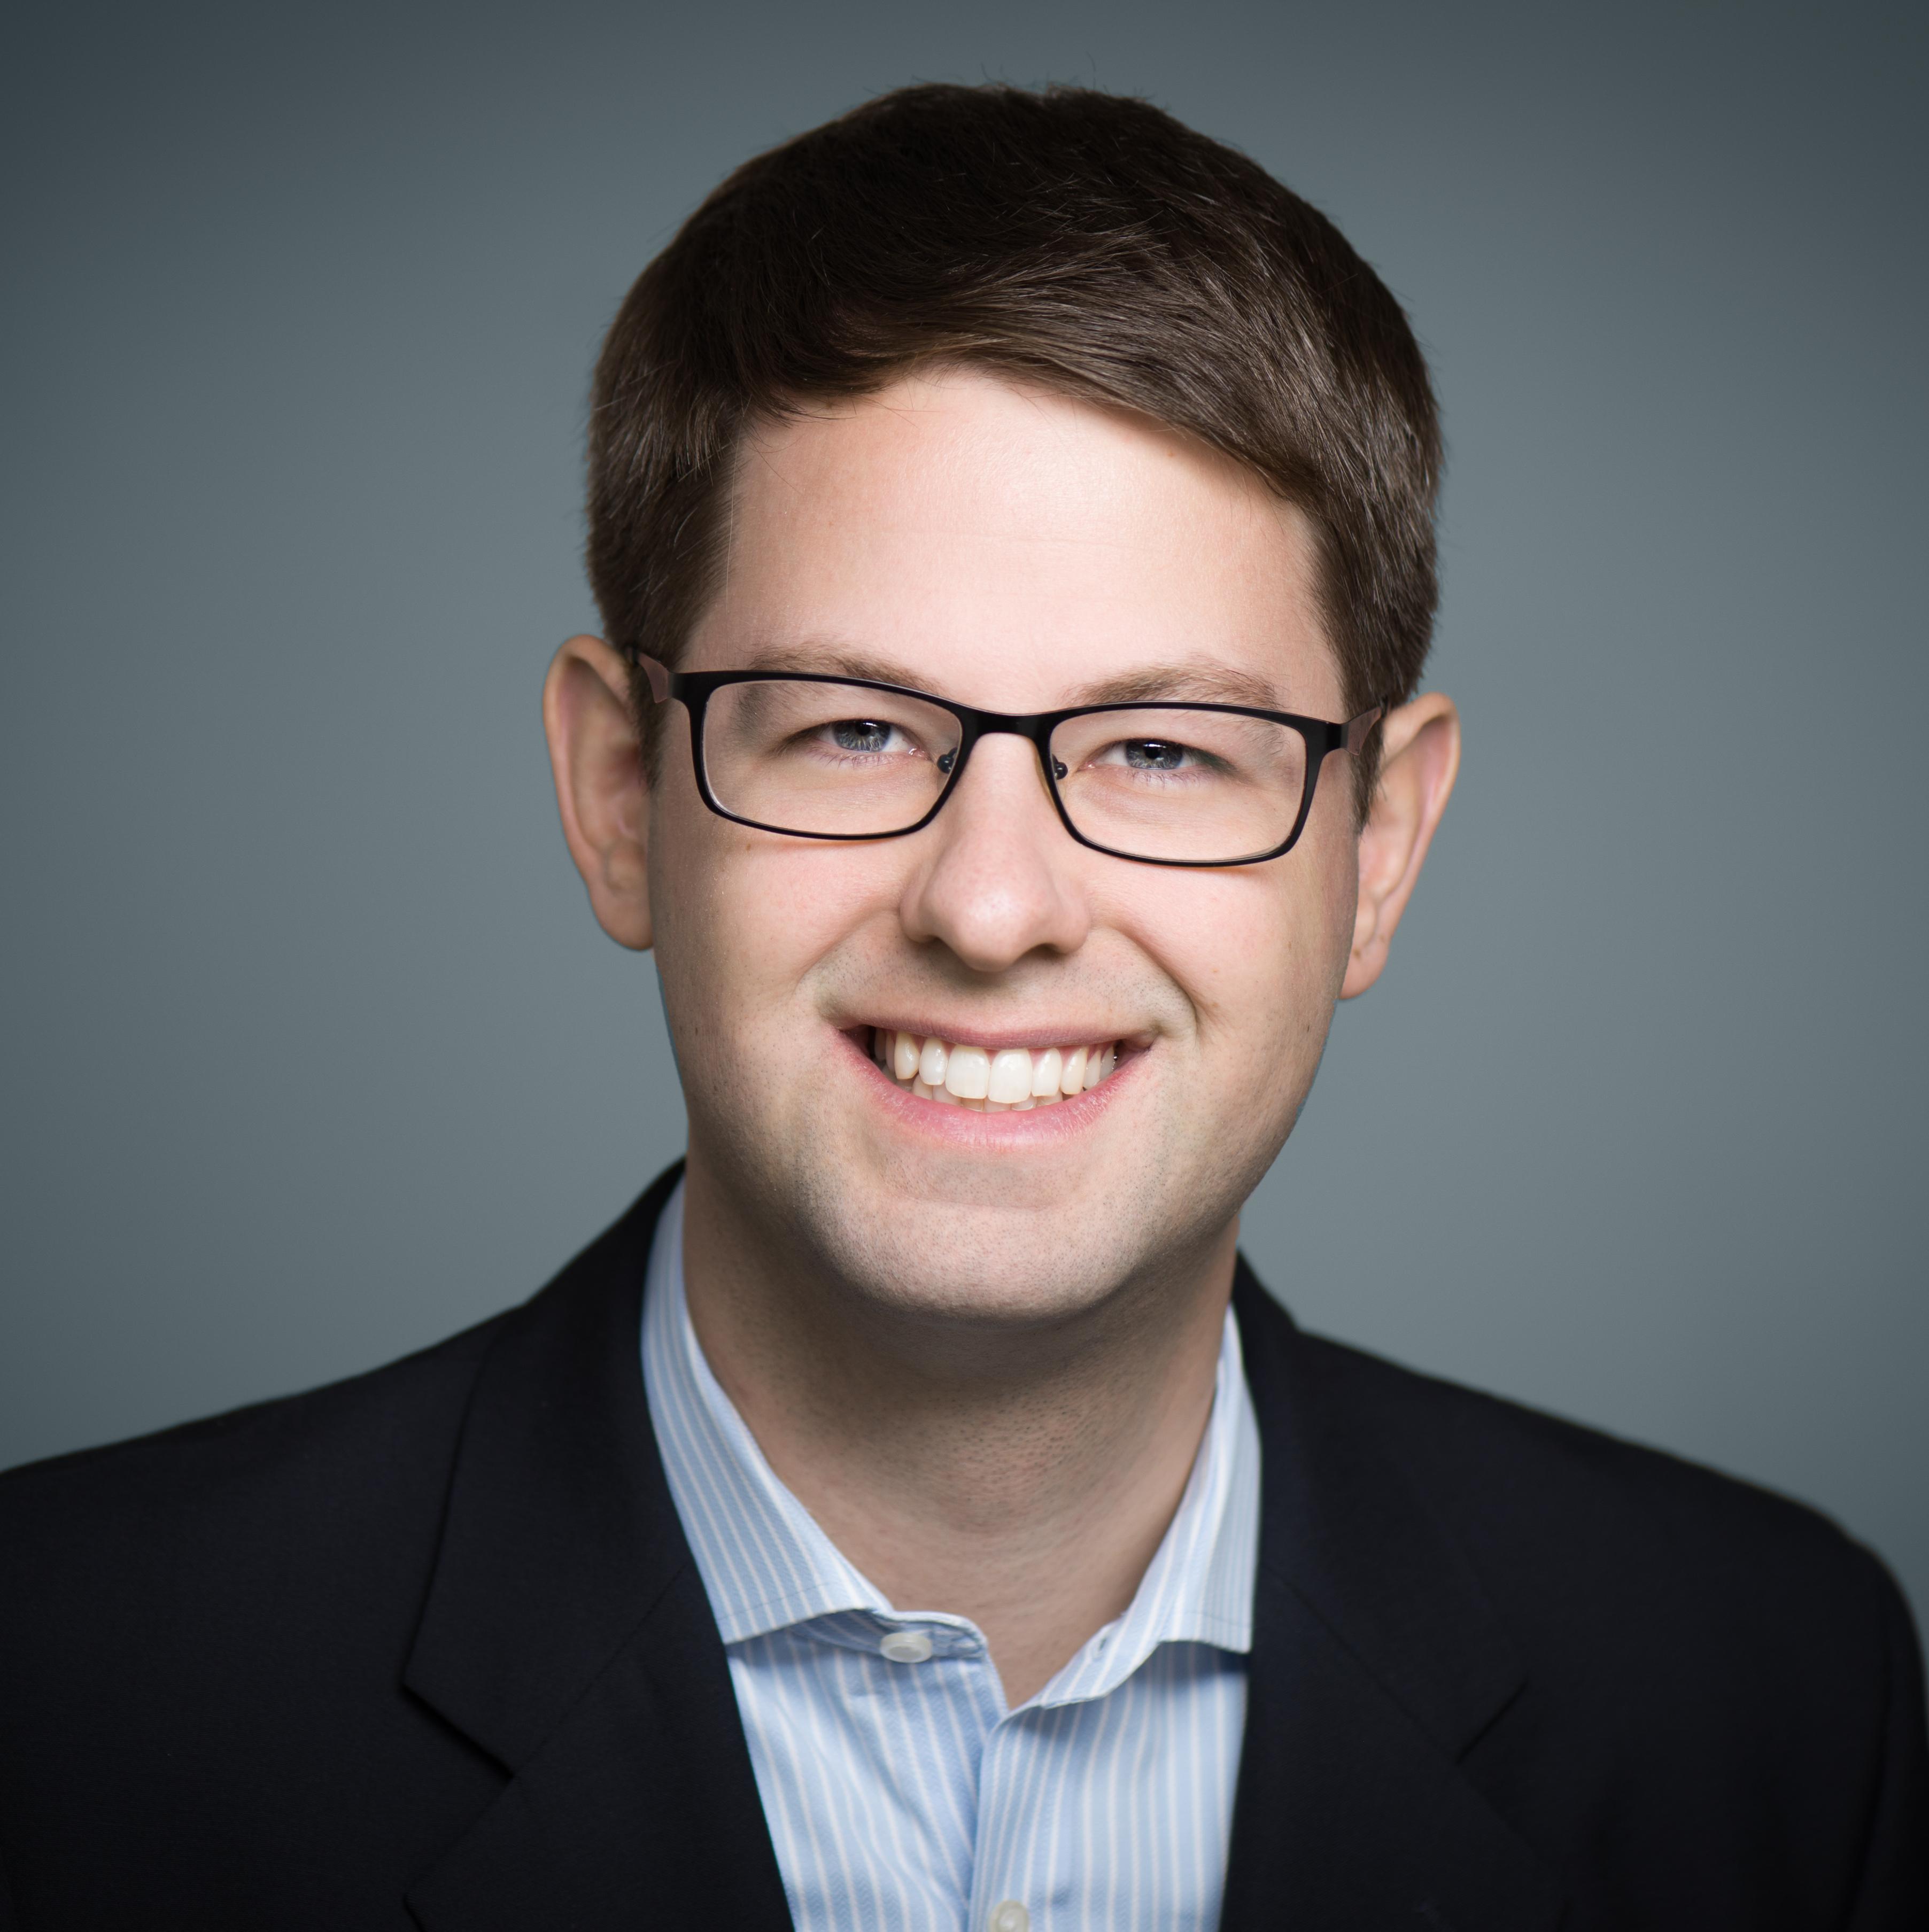 Tobias Auferoth, CFA